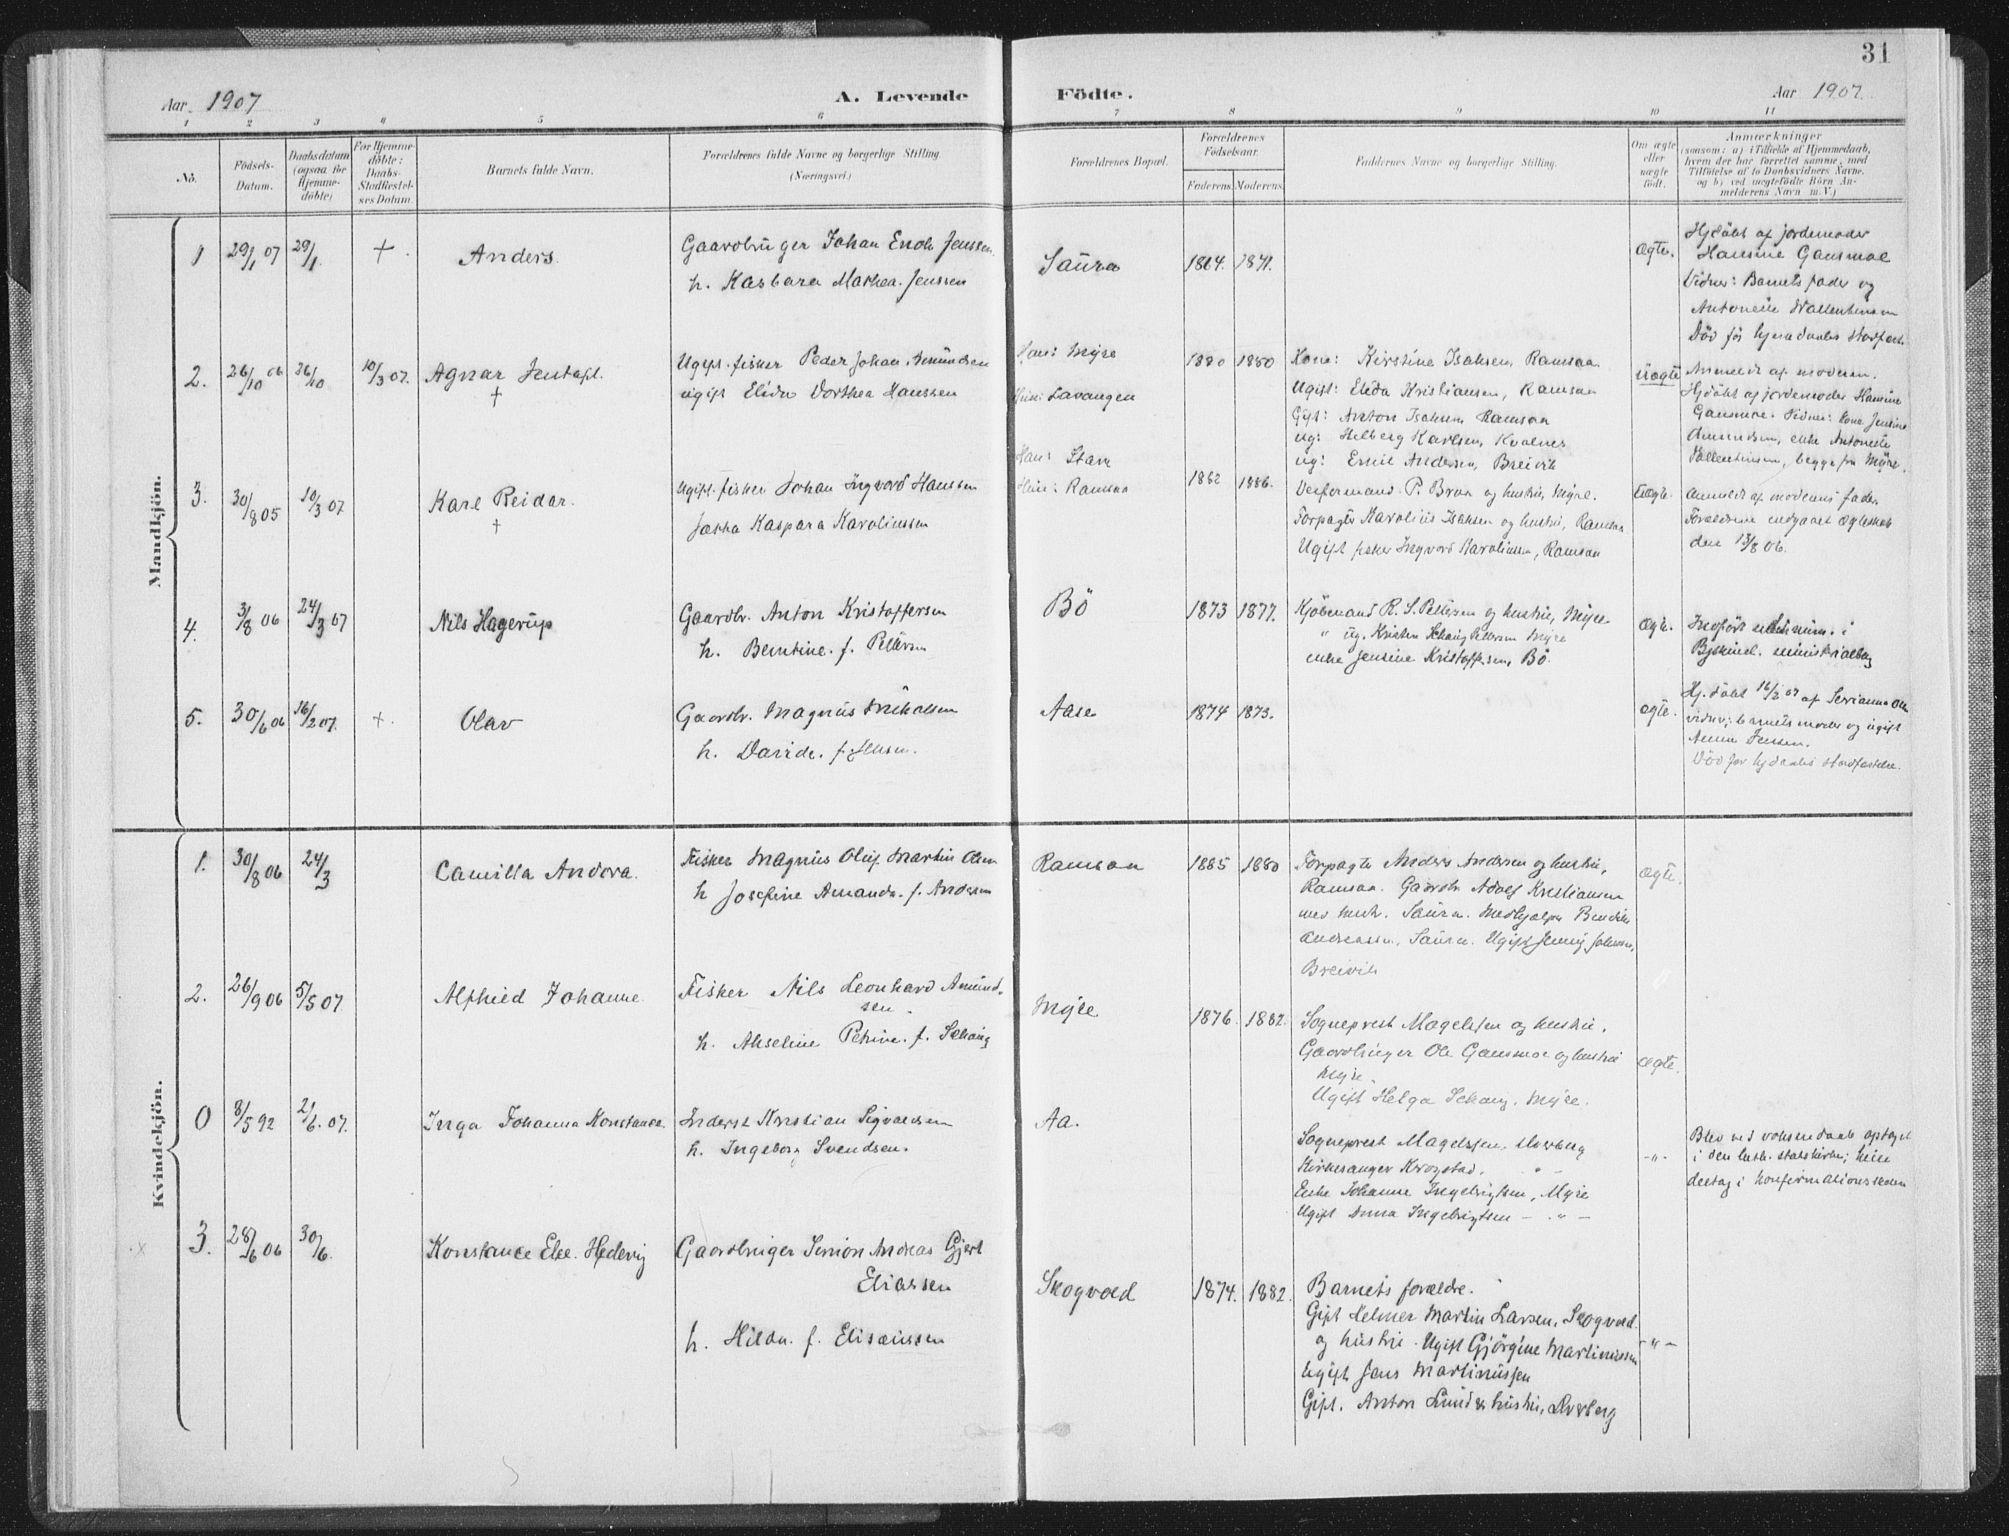 SAT, Ministerialprotokoller, klokkerbøker og fødselsregistre - Nordland, 897/L1400: Ministerialbok nr. 897A07, 1897-1908, s. 31